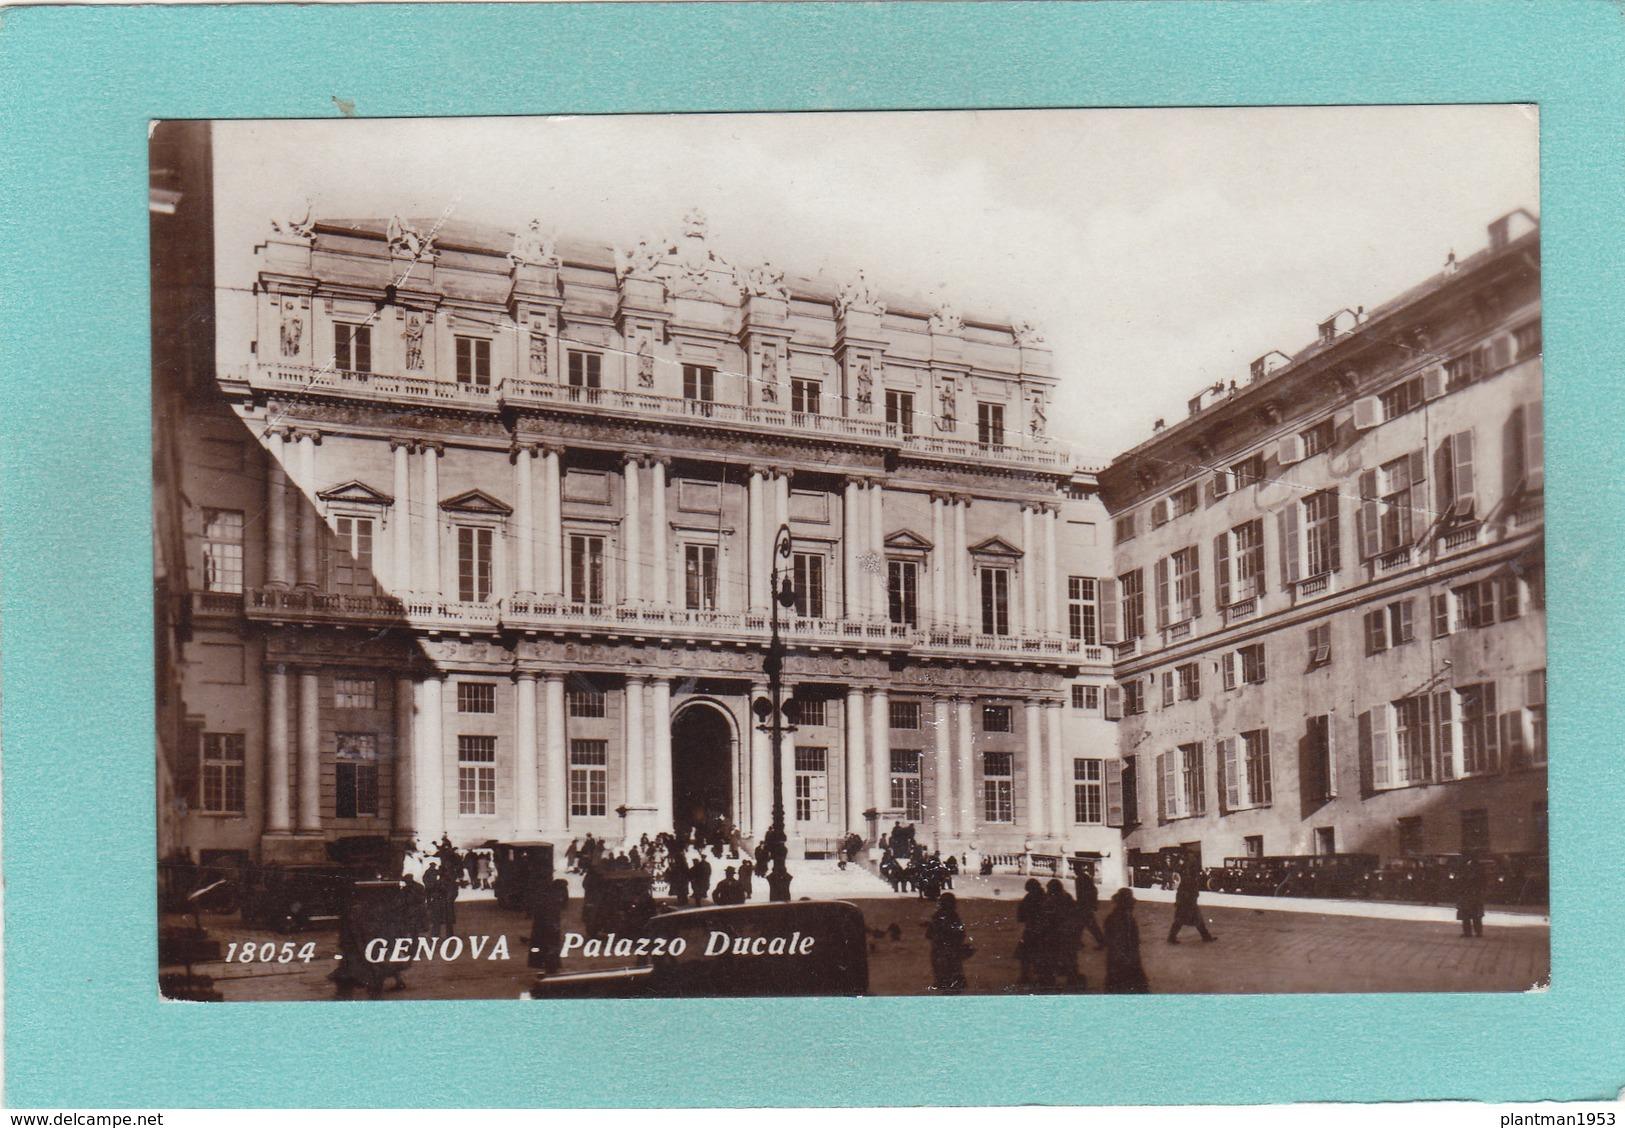 Old Postcard Of Palazzo Ducale,Genova,Genoa, Liguria, Italy,Posted,K35. - Genova (Genoa)